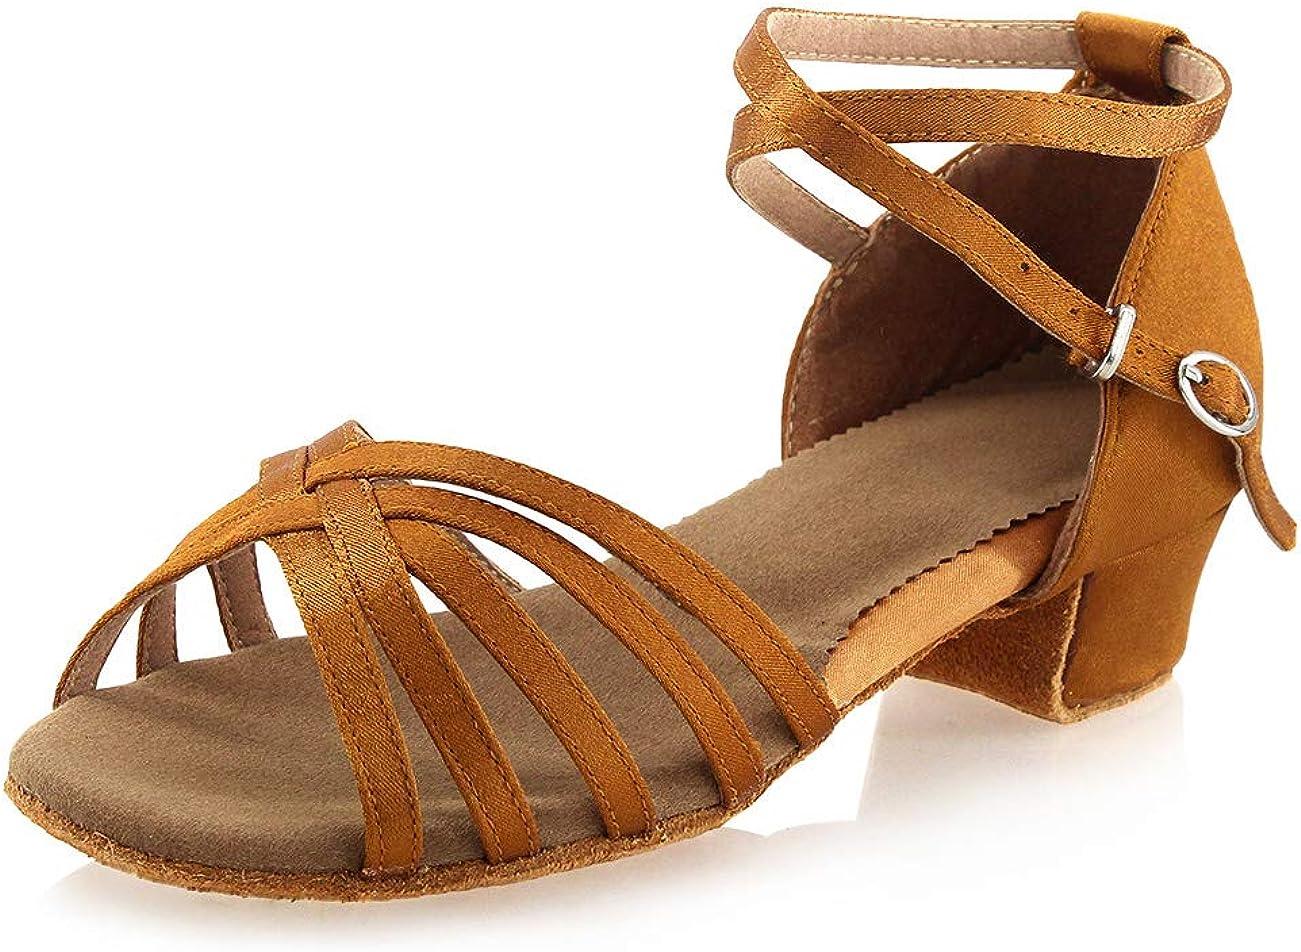 Daydance Tan Girls Latin Dance Shoes Women Low Heels Tango Salsa Ballroom Shoes